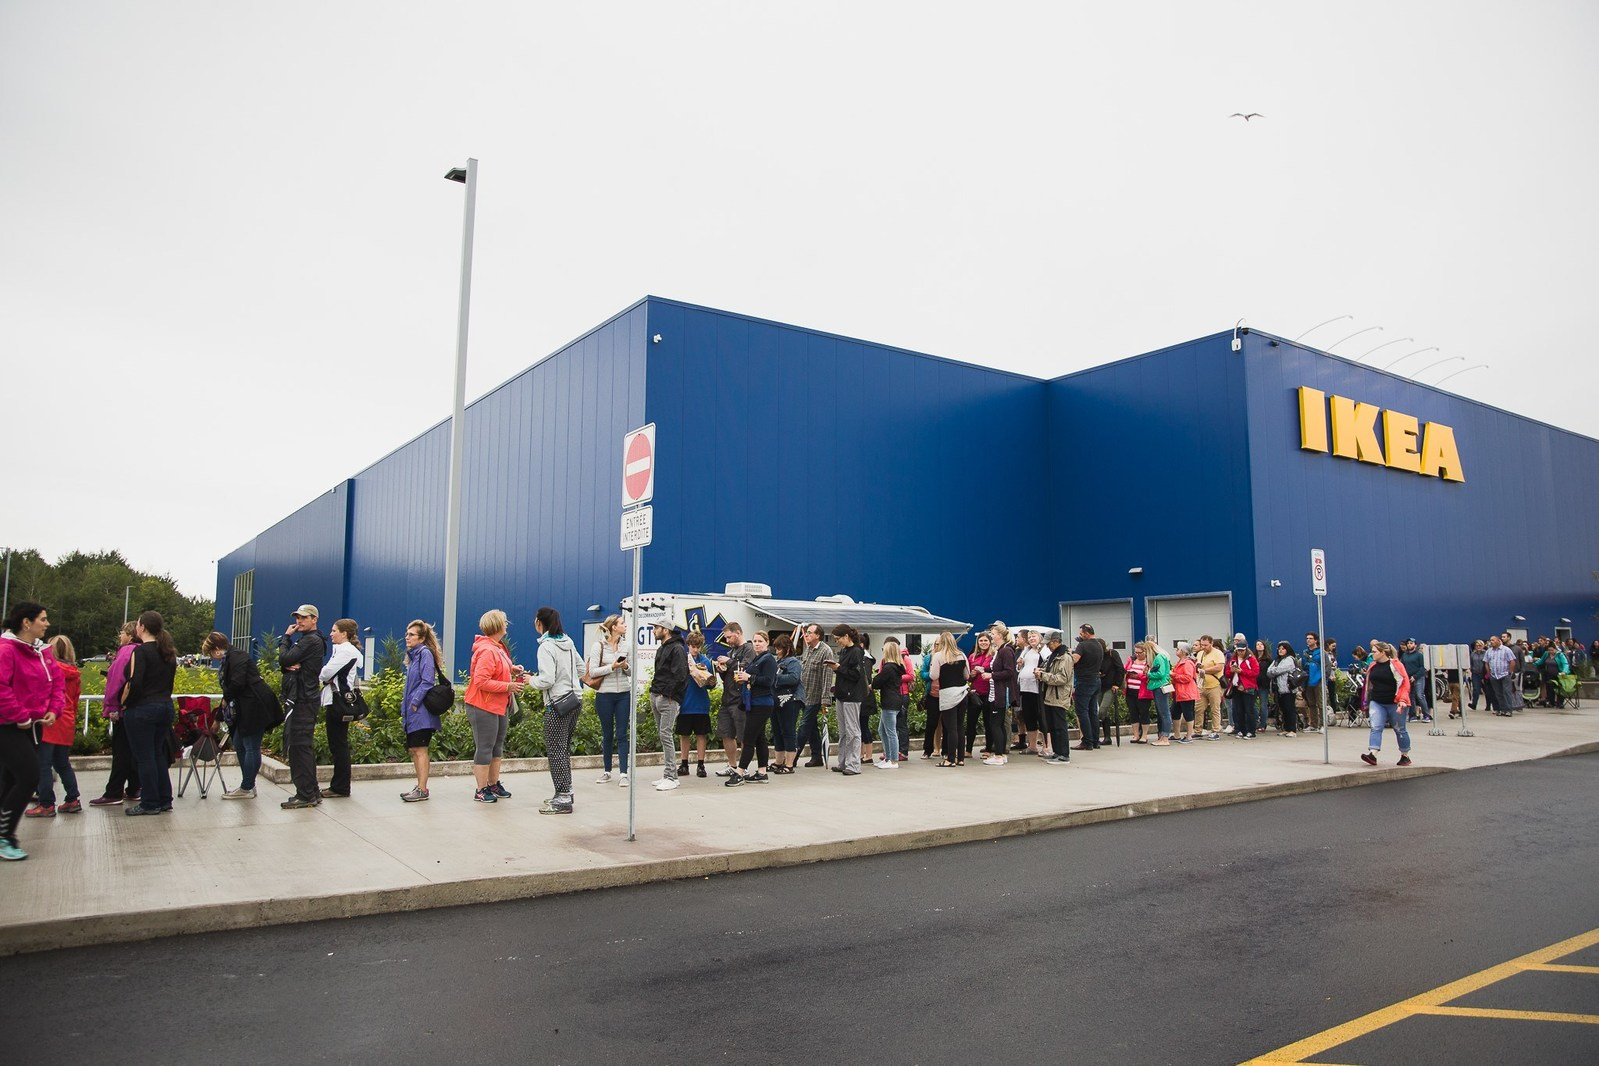 Photo Credit: Stéphane Audet (CNW Group/IKEA Canada)